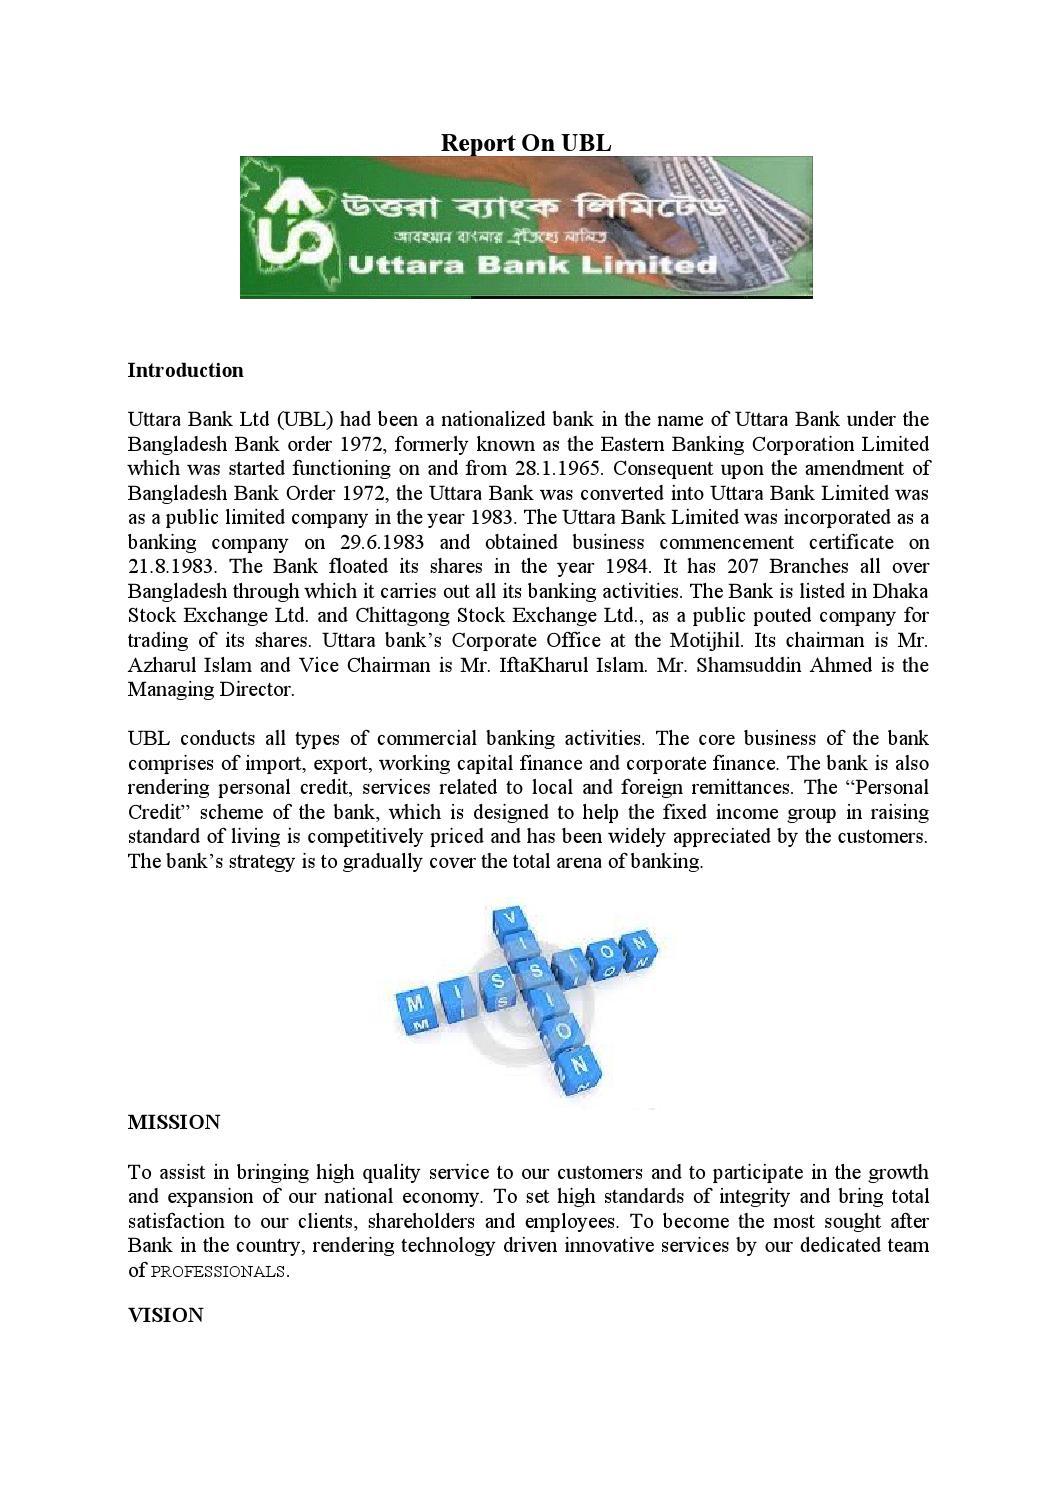 Report on eastern bank ltd